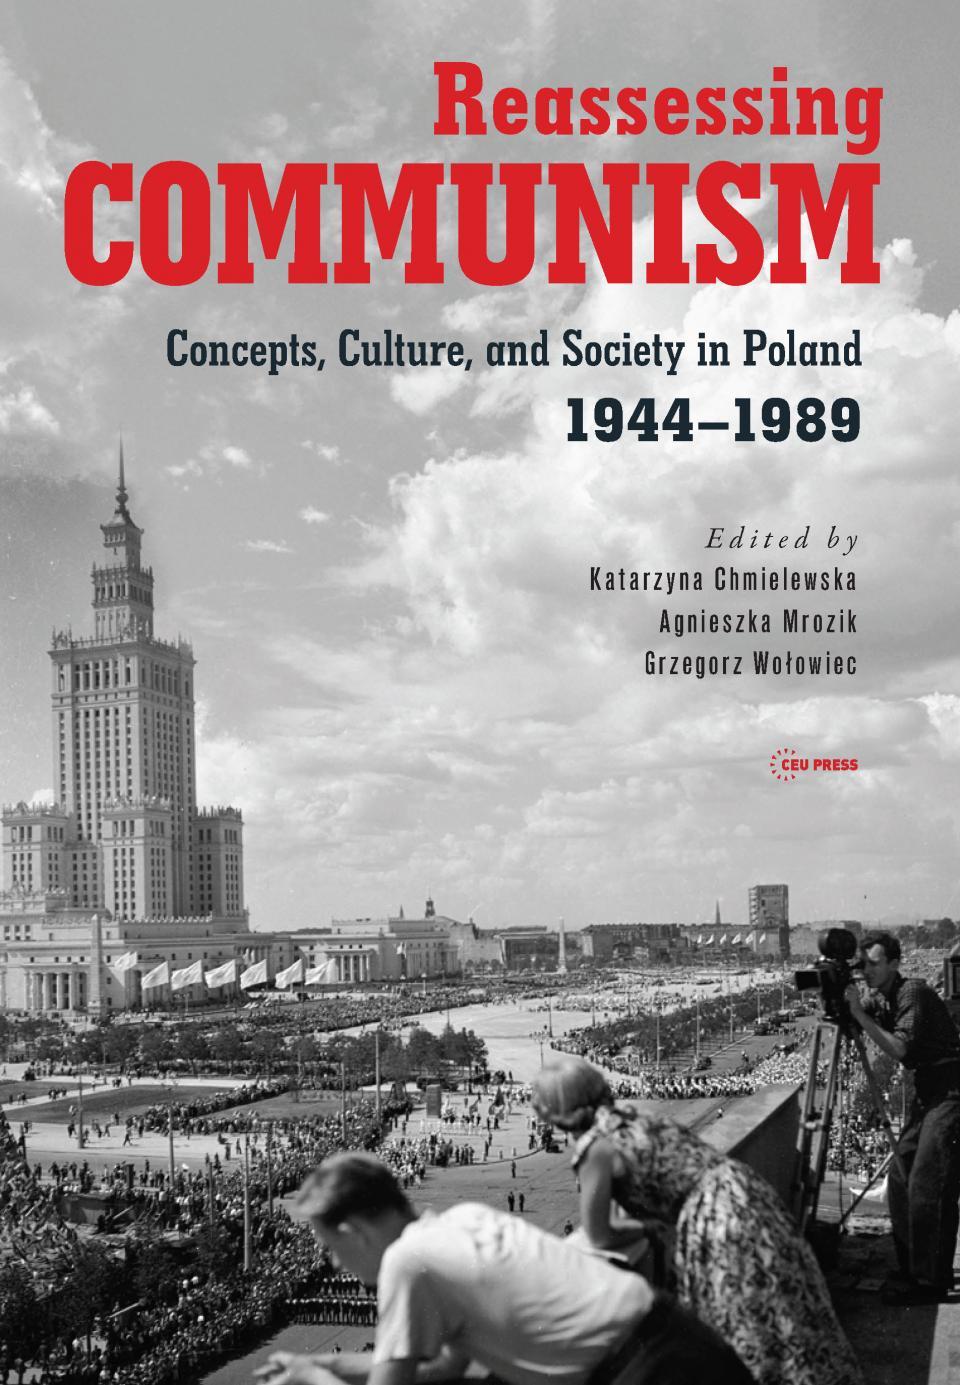 The cover of the book which is being reviewed about Communism, Edited by Katarzyna Chmielewska, Agnieszka Mrozik, Grzegorz Wołowiec